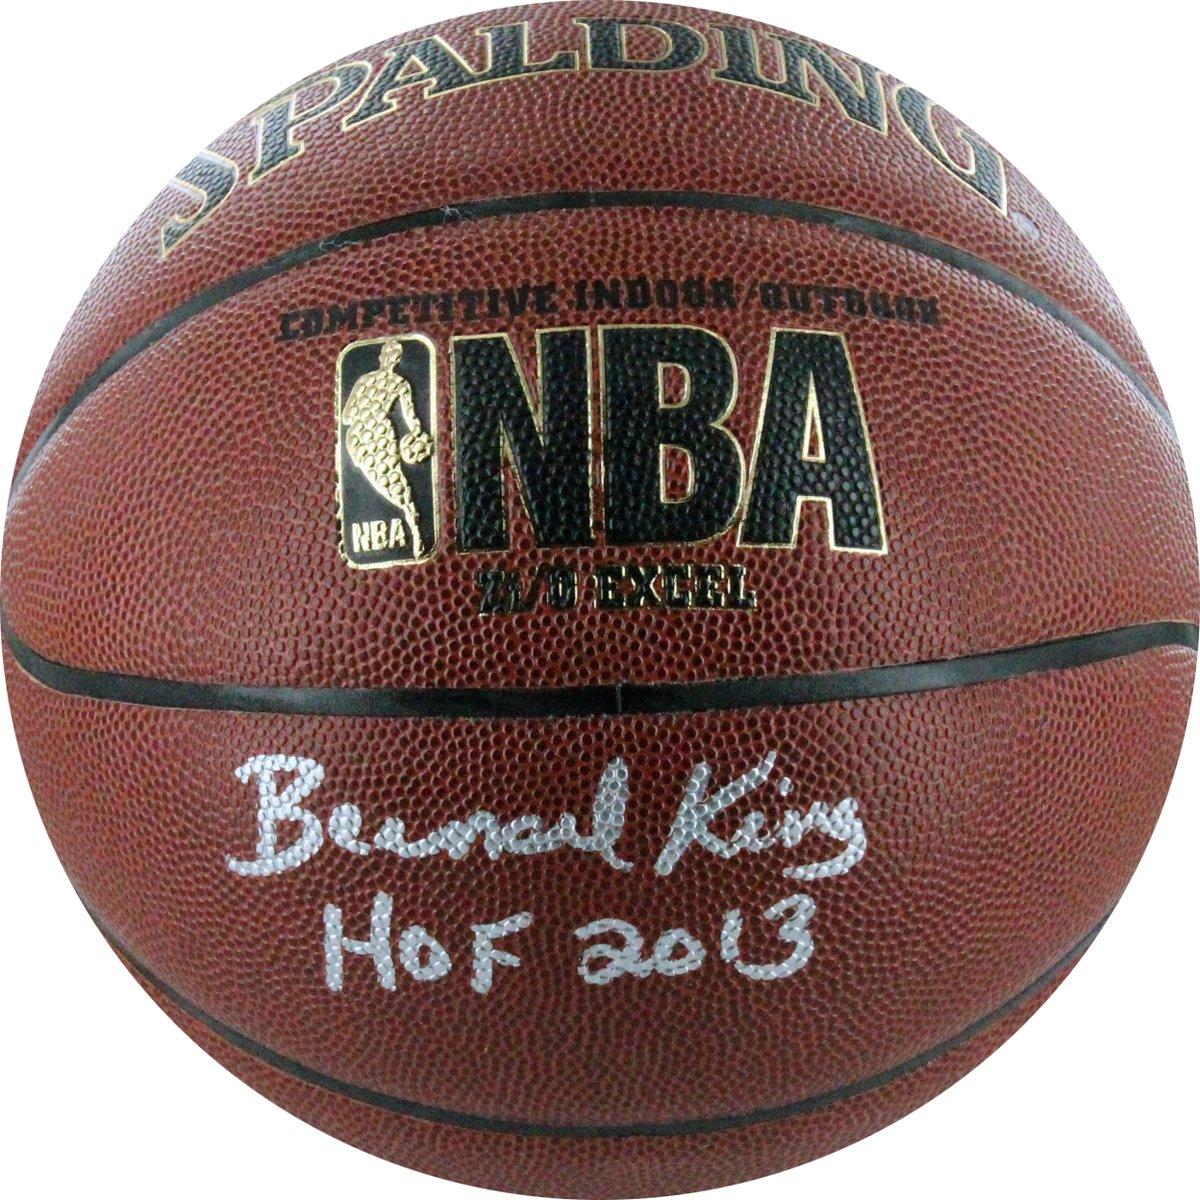 NBA New York Knicks Bernard King Autographed Basketball with ''HOF'' Inscription by Steiner Sports